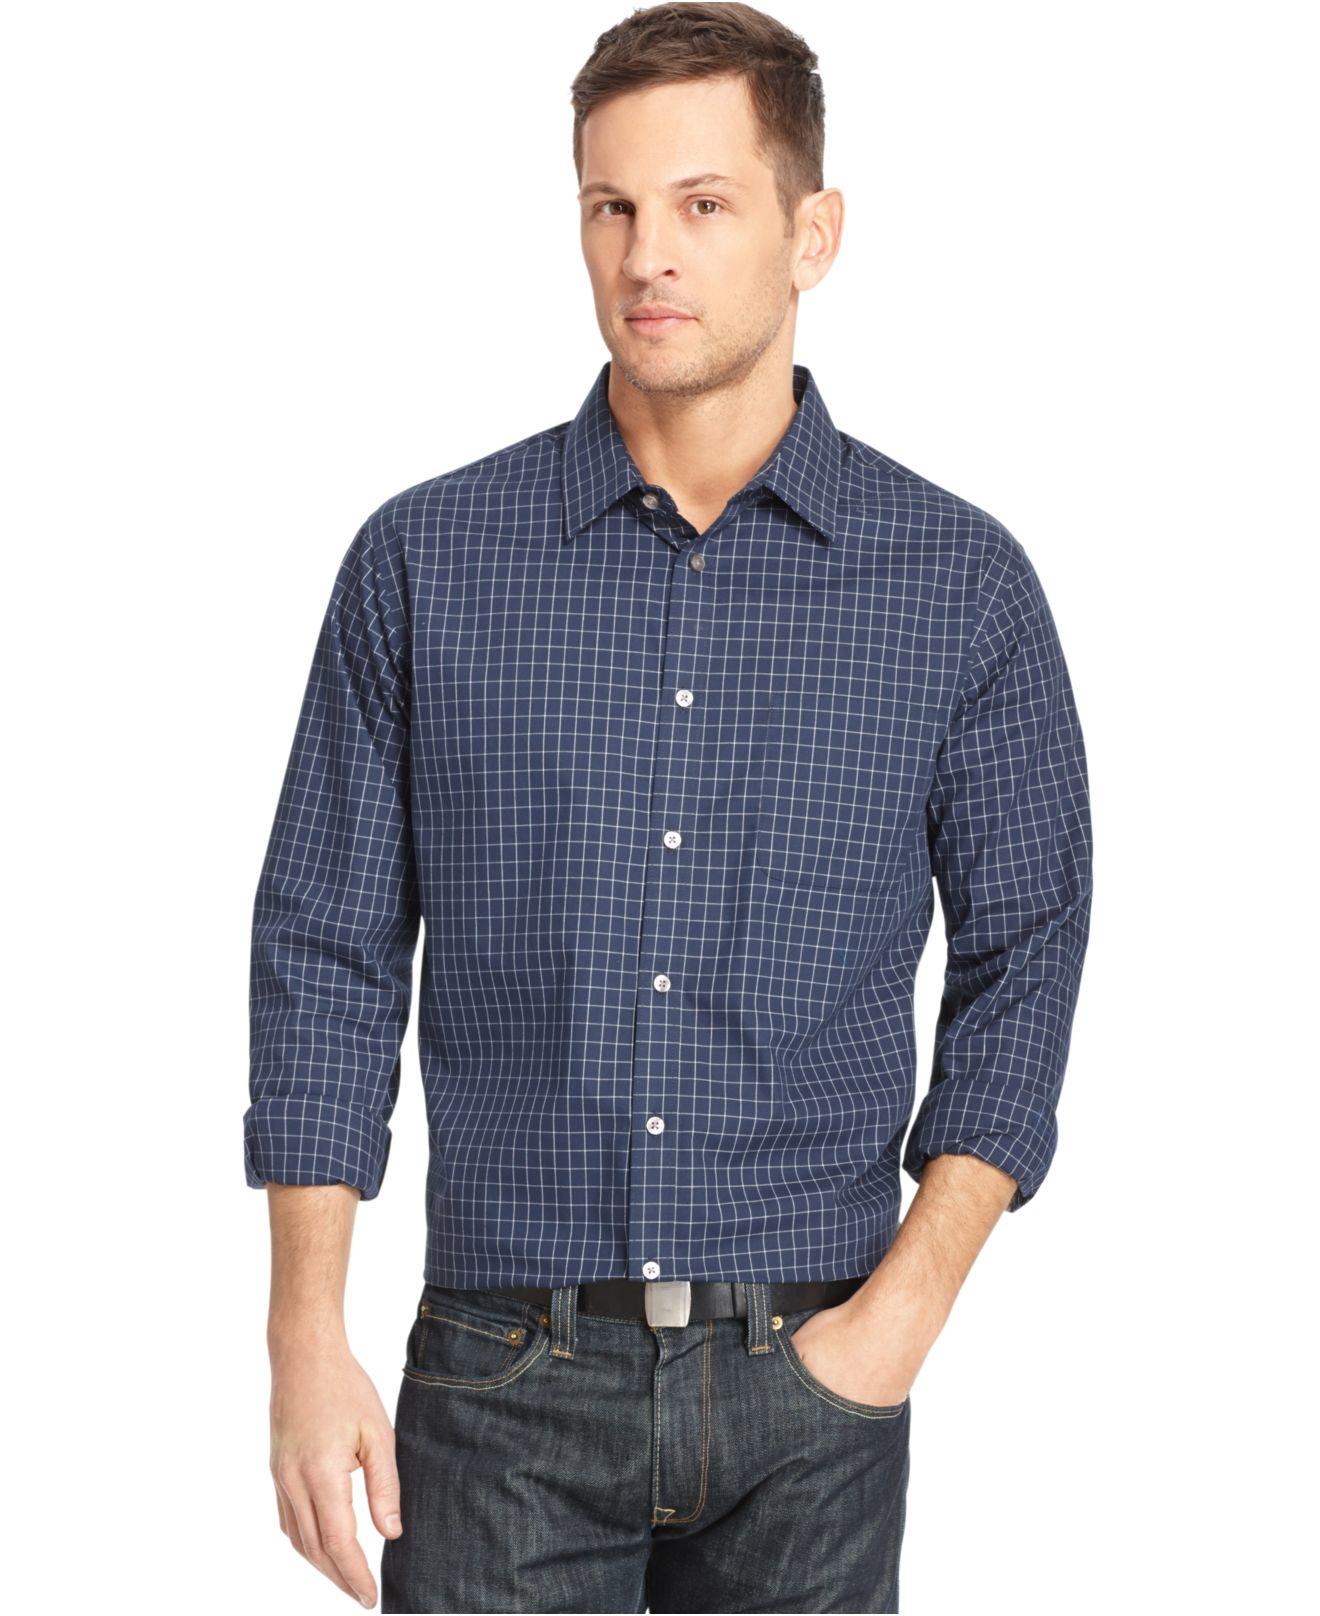 Van Heusen Long Sleeve No Iron Shirt In Natural For Men Lyst